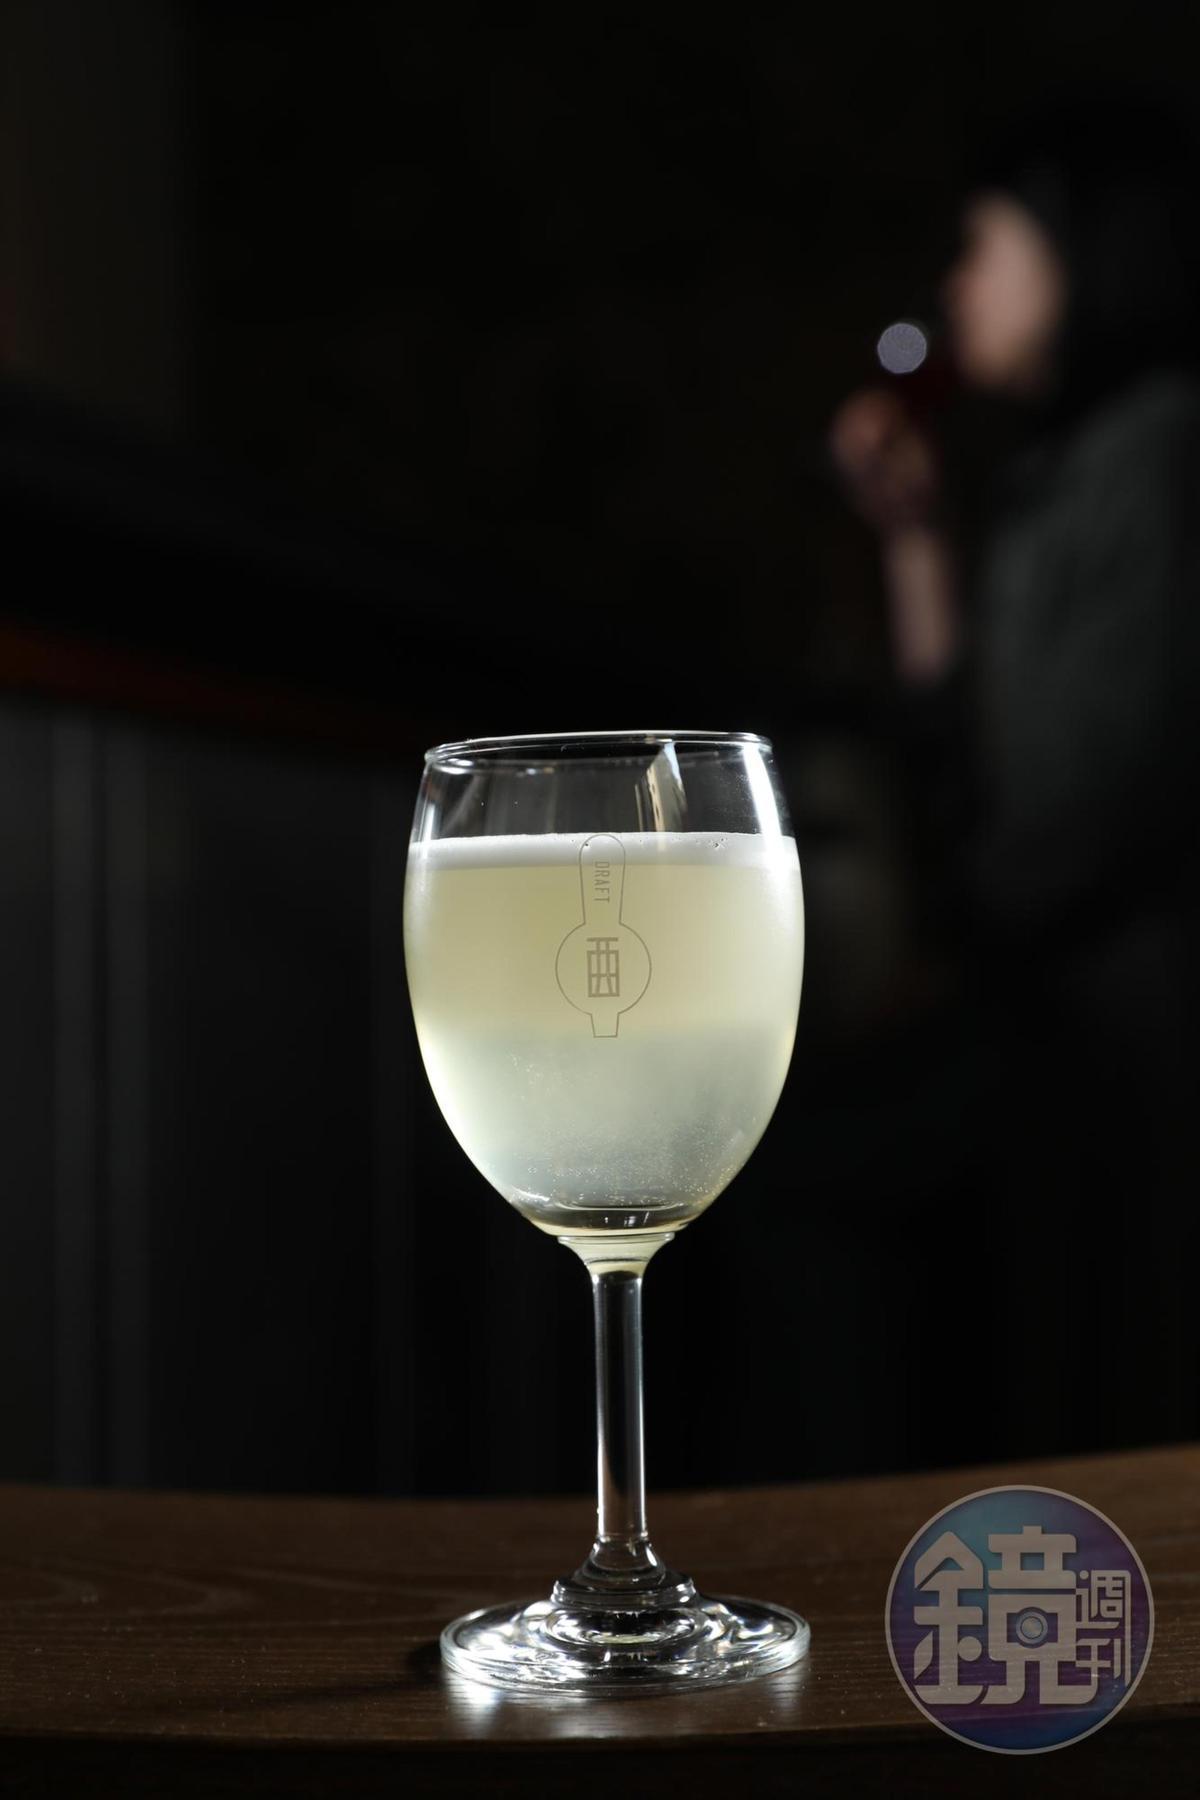 「Sherry Cobbler」野牛草伏特加陪襯雪莉酒,帶有草香味的甜香,鳳梨則搭襯雪莉酒的堅果味。(200元/杯)